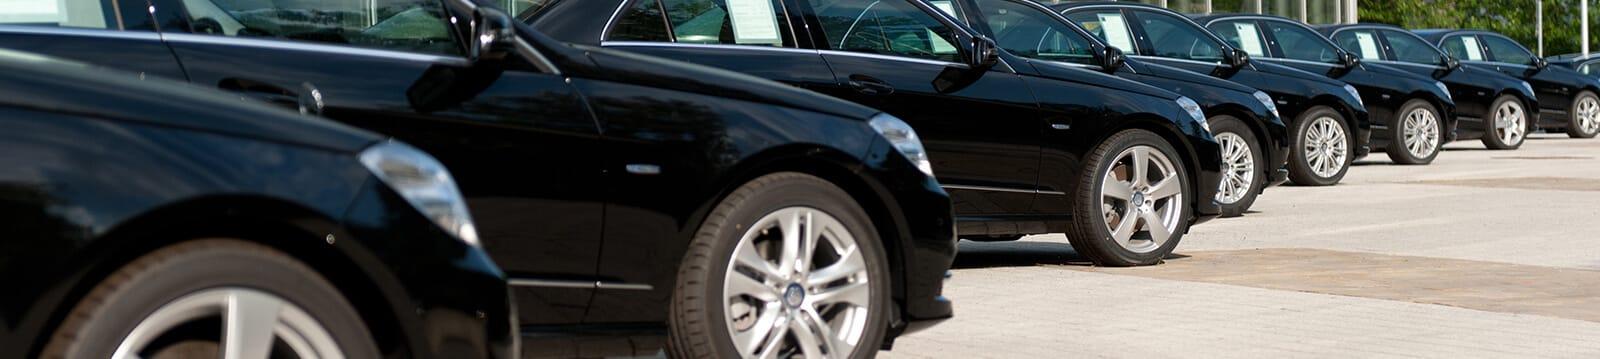 Car Rental In Azerbaijan Avis Car Rental In Azerbaijan